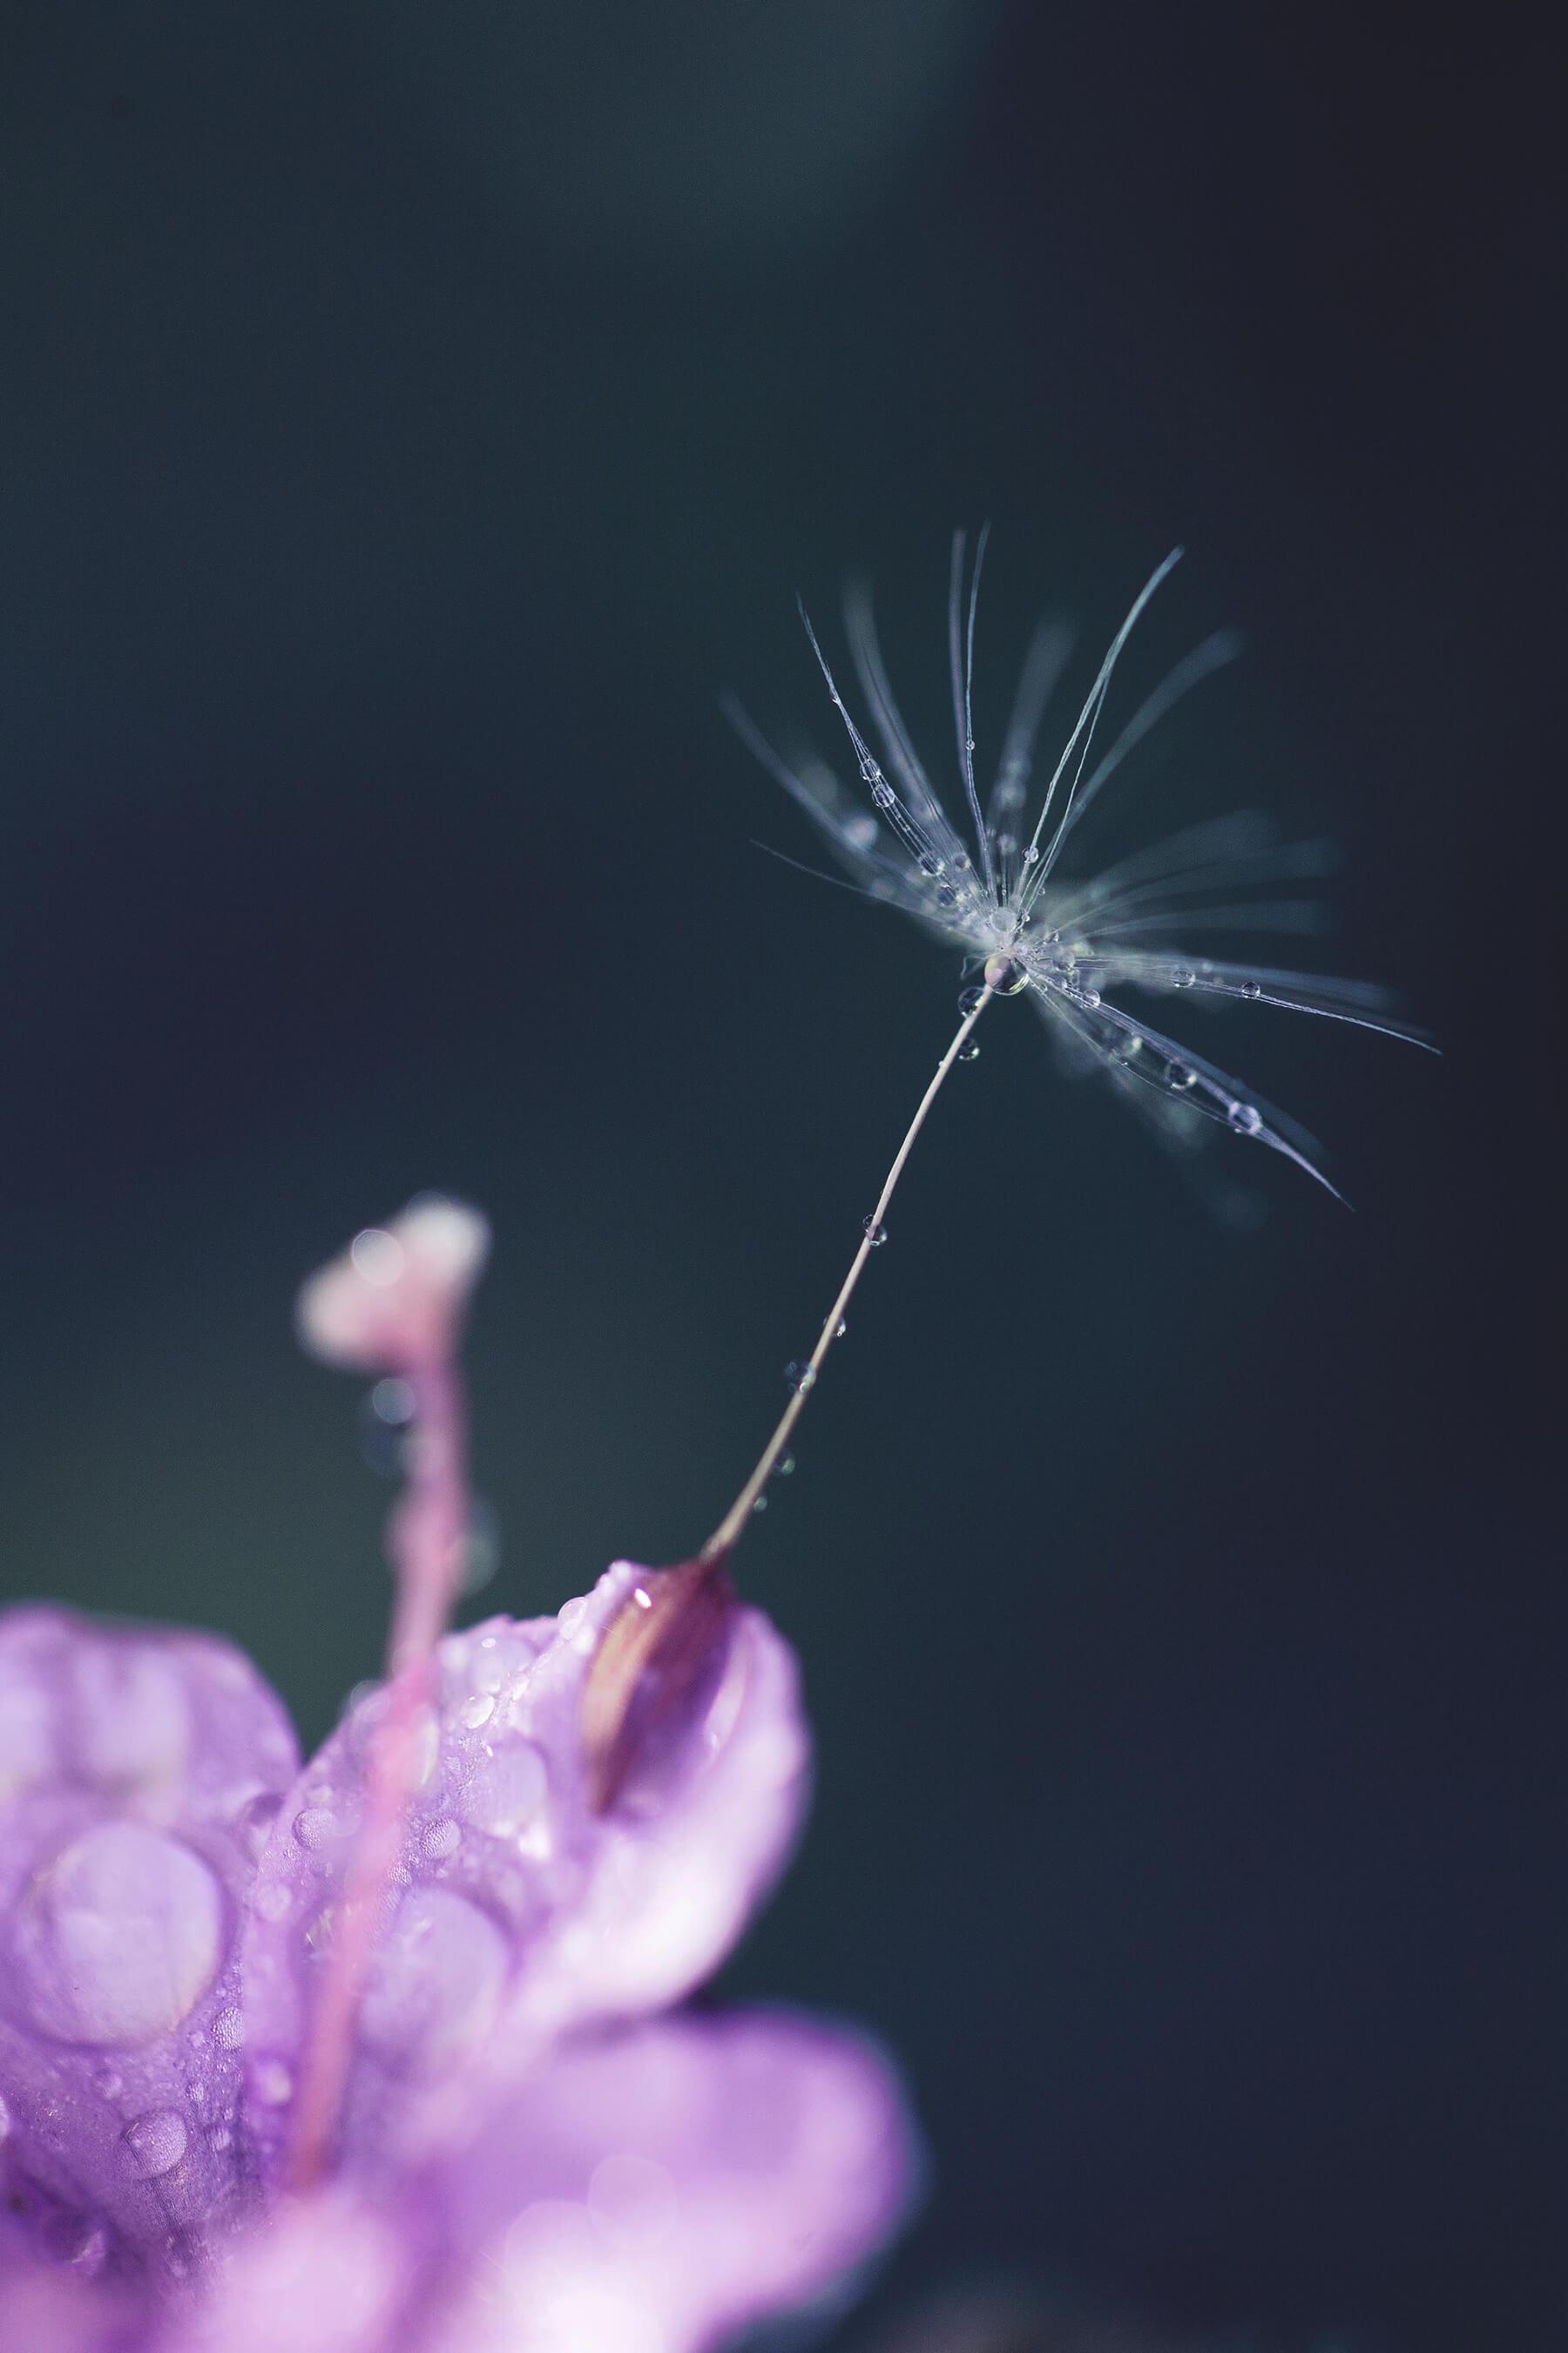 Macro photo of dew on flower